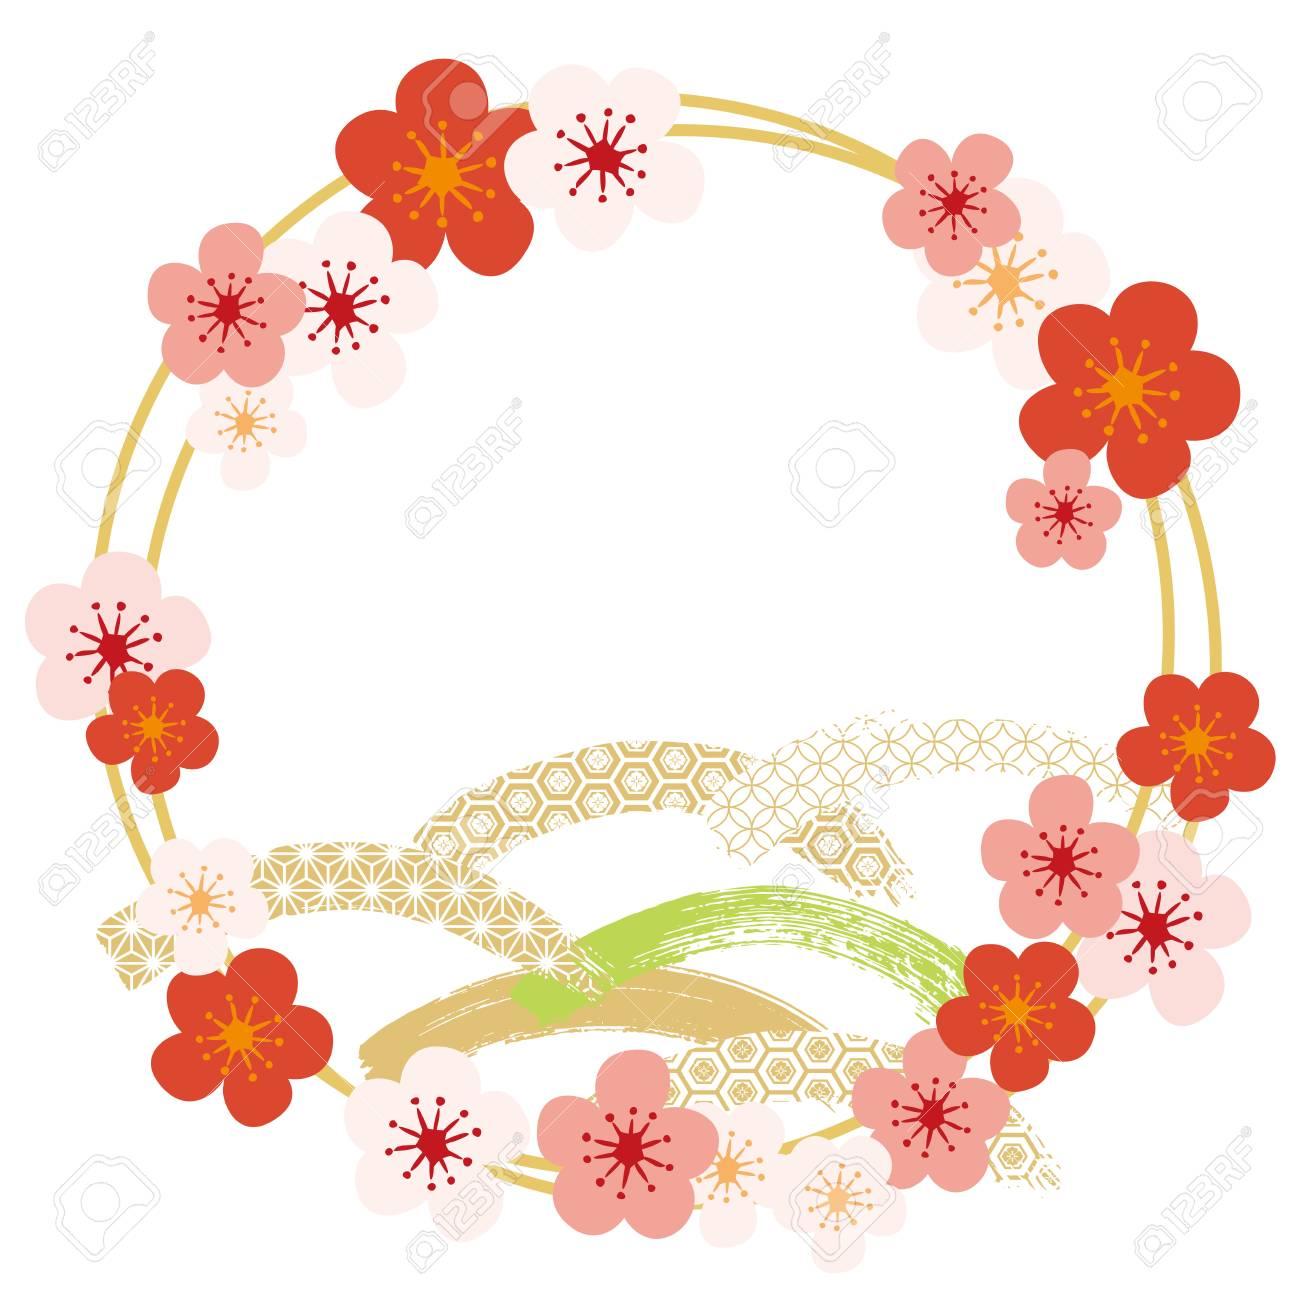 A Japanese pattern background. - 88178041